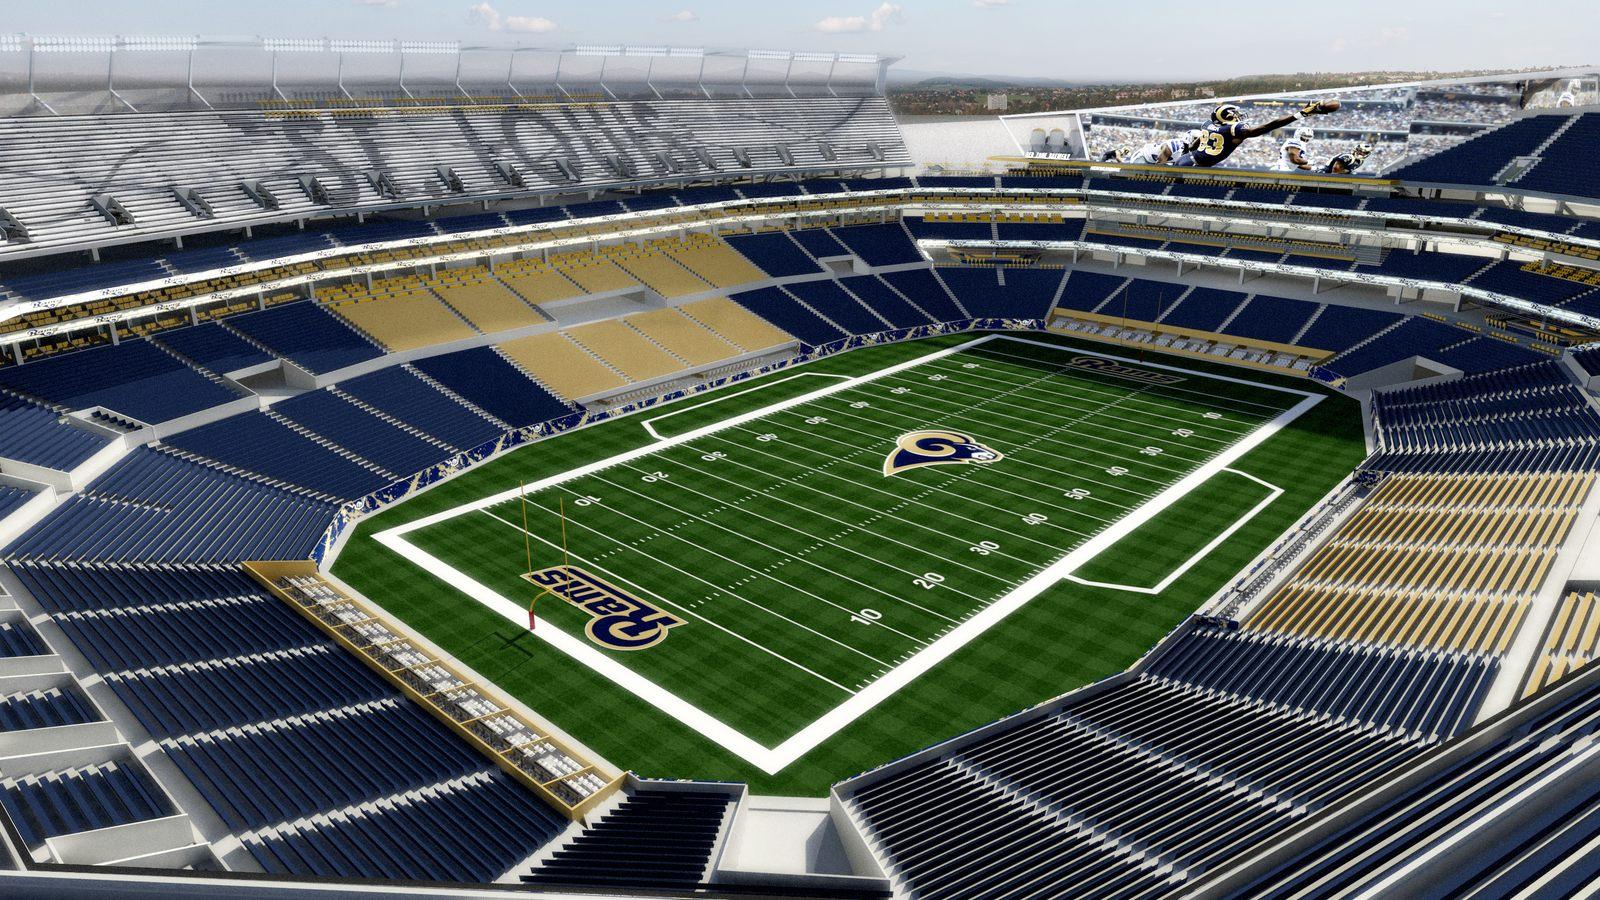 Design St Louis Nfl Stadium Stadiumdb Com